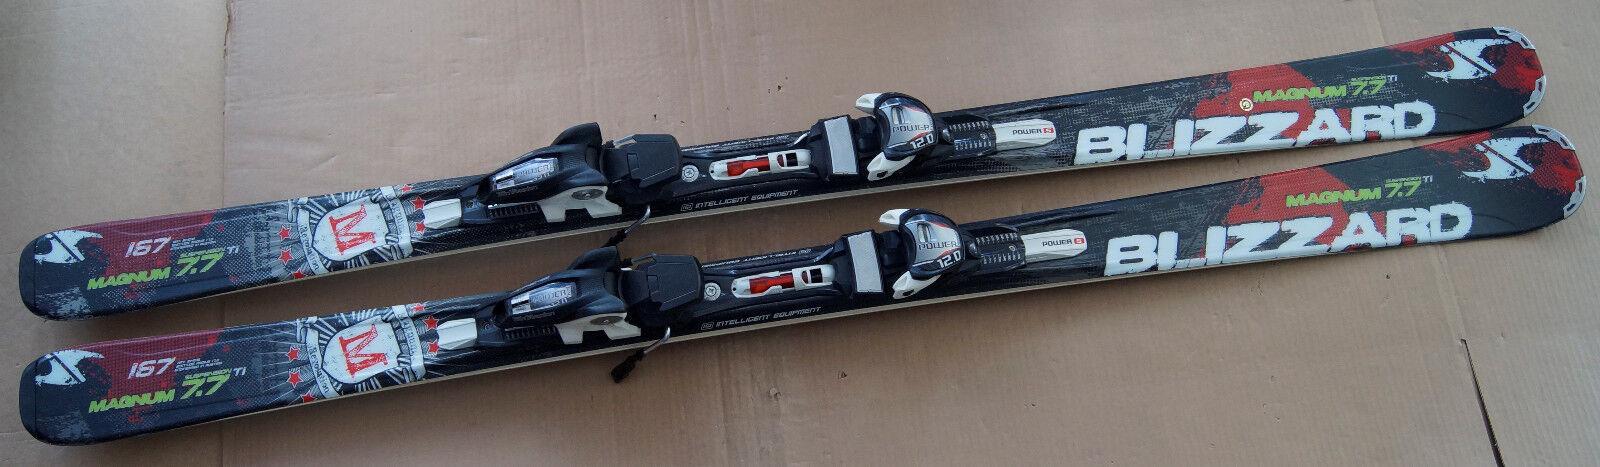 Blizzard Ski Magnum 7.7 TI + Marker Power 12.0 Bindung 167 cm o. 174 cm (170 cm)